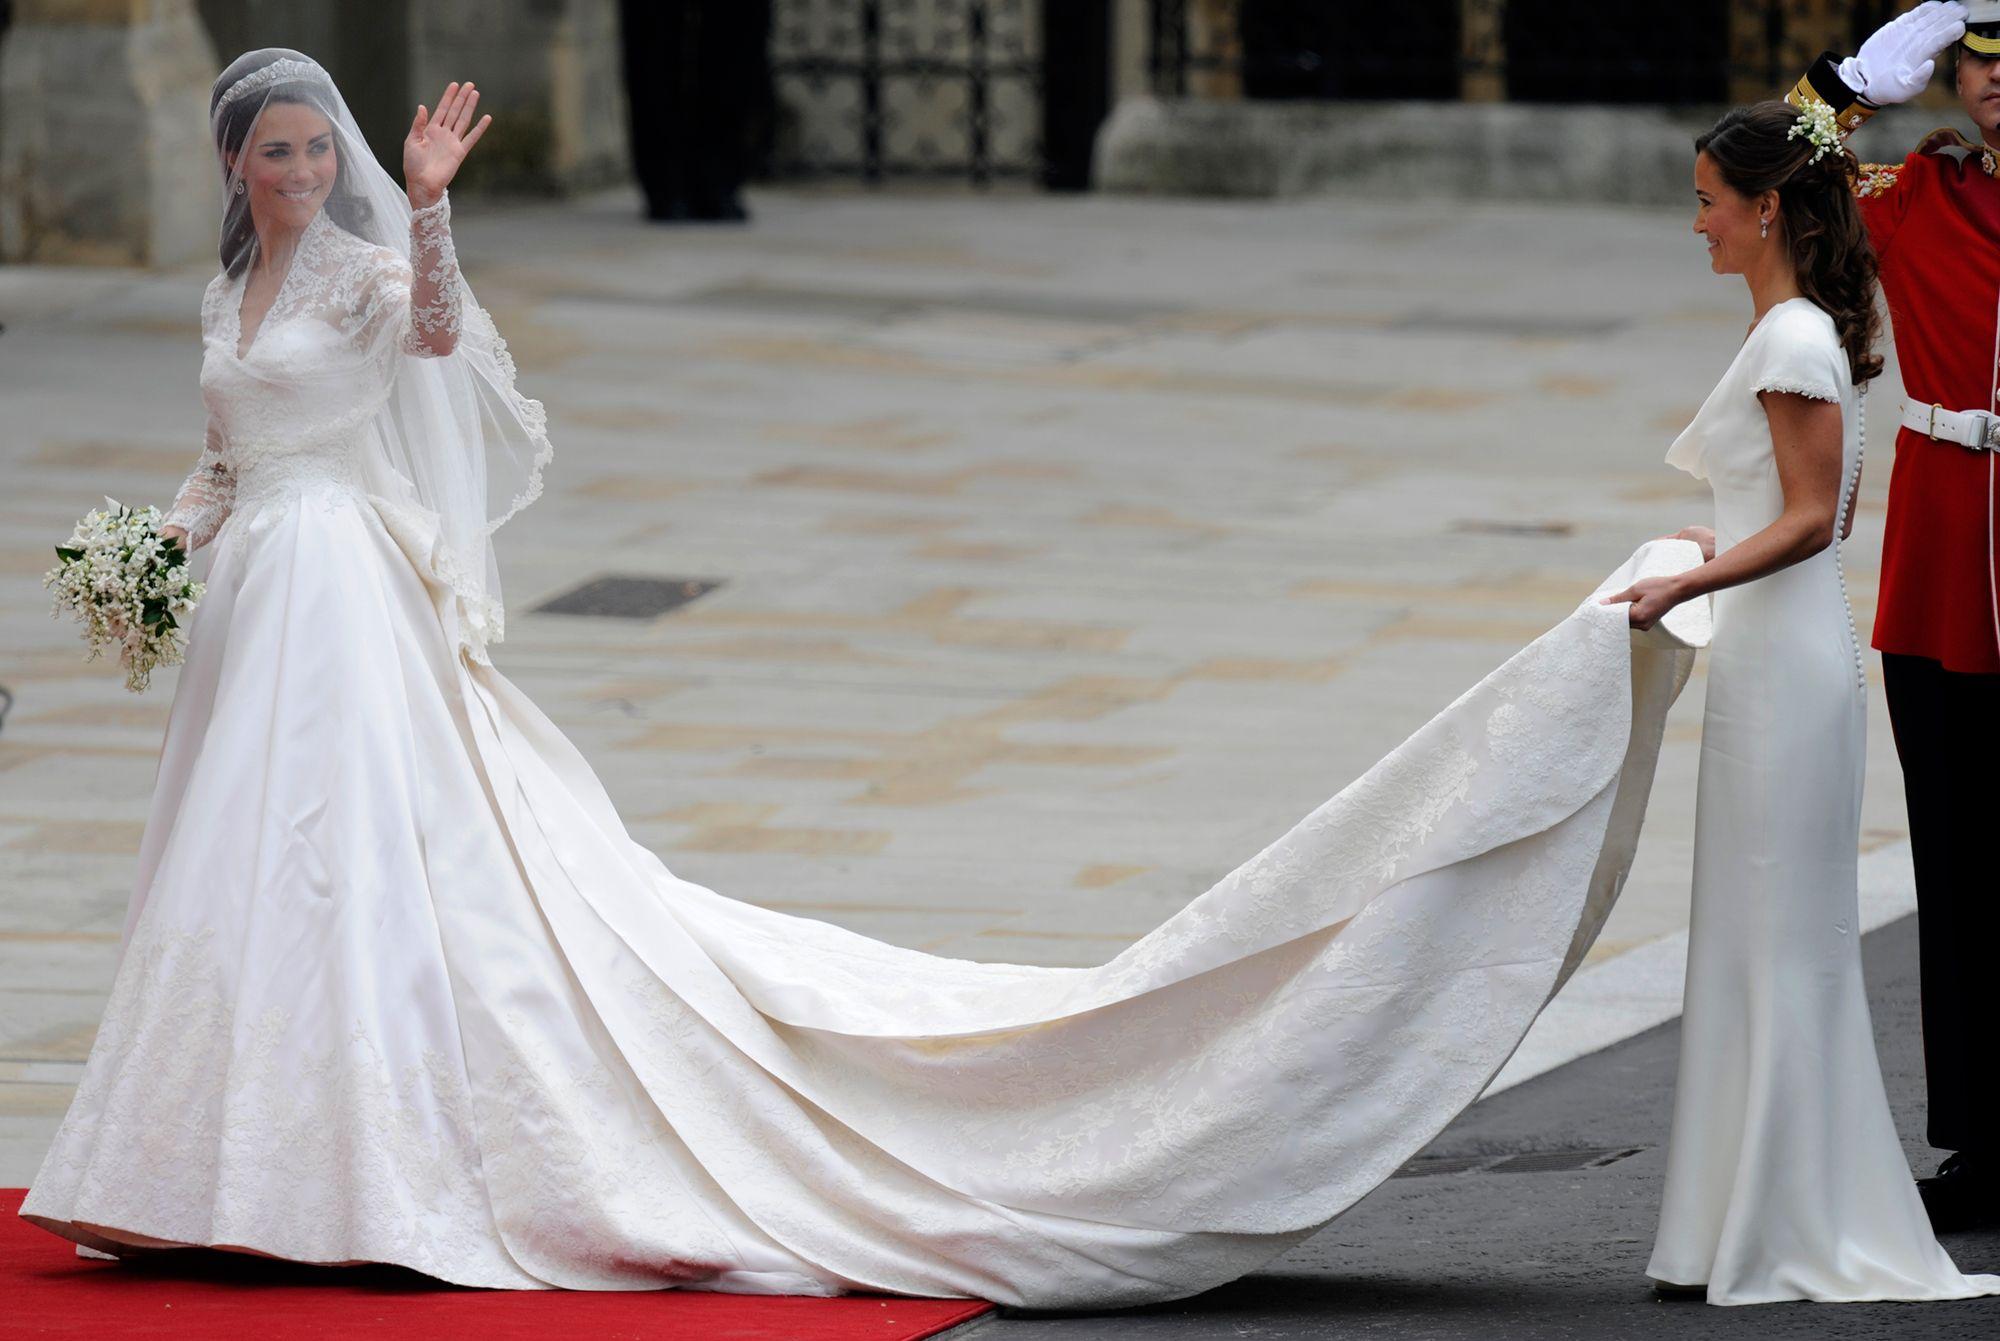 Best Wedding Dresses Of All Time Top 10 Celebrity Wedding Dresses